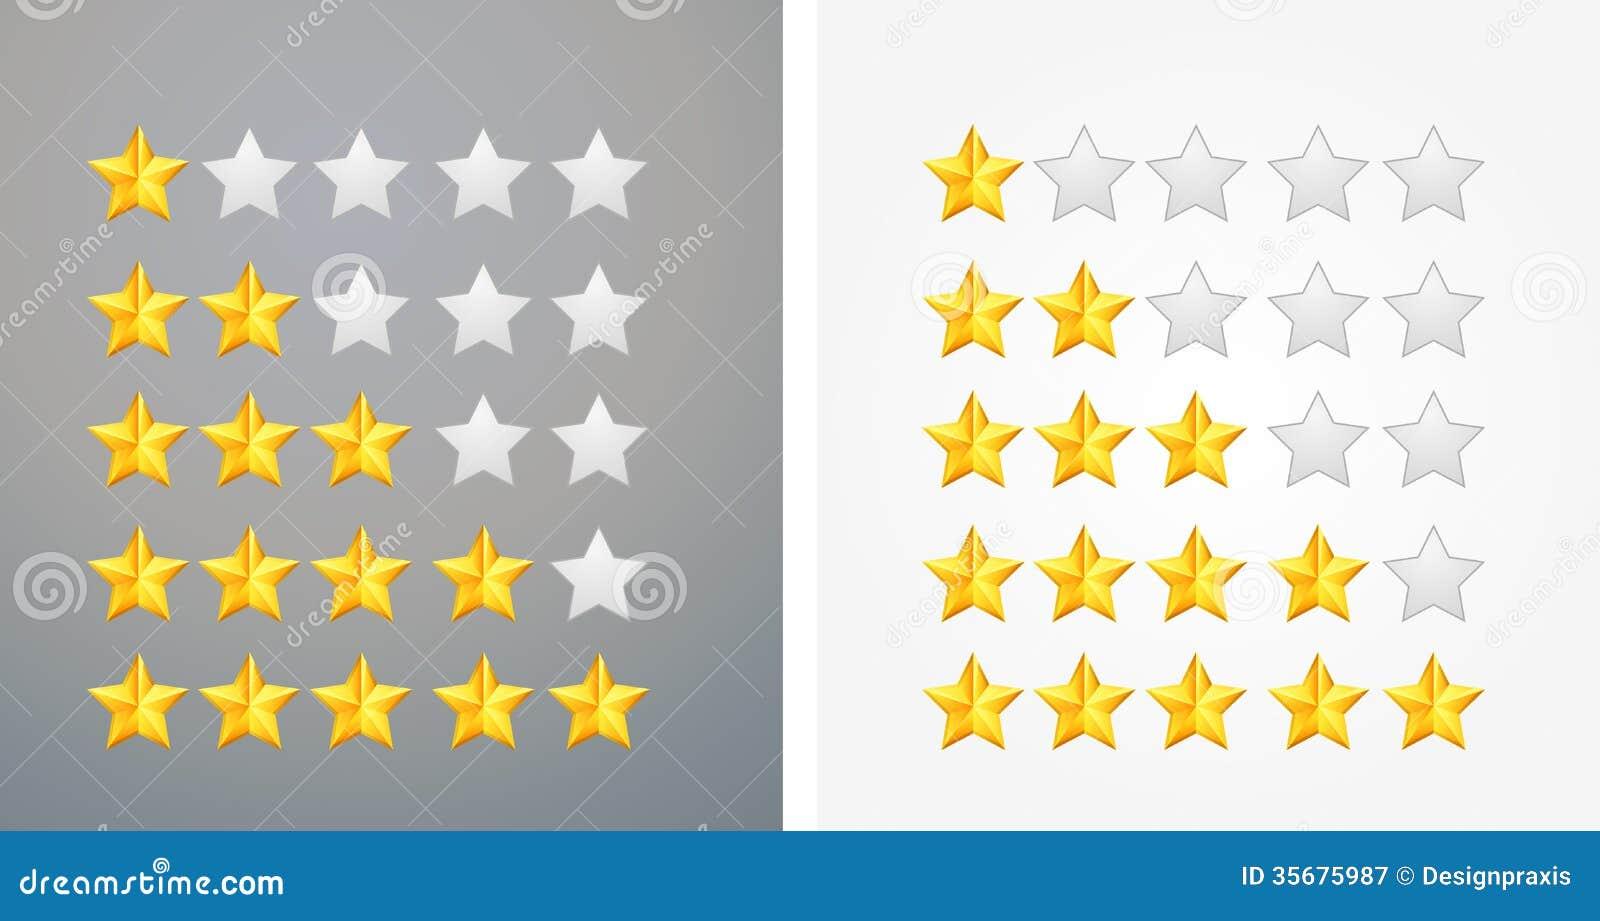 star rating icon - illustration stock vector